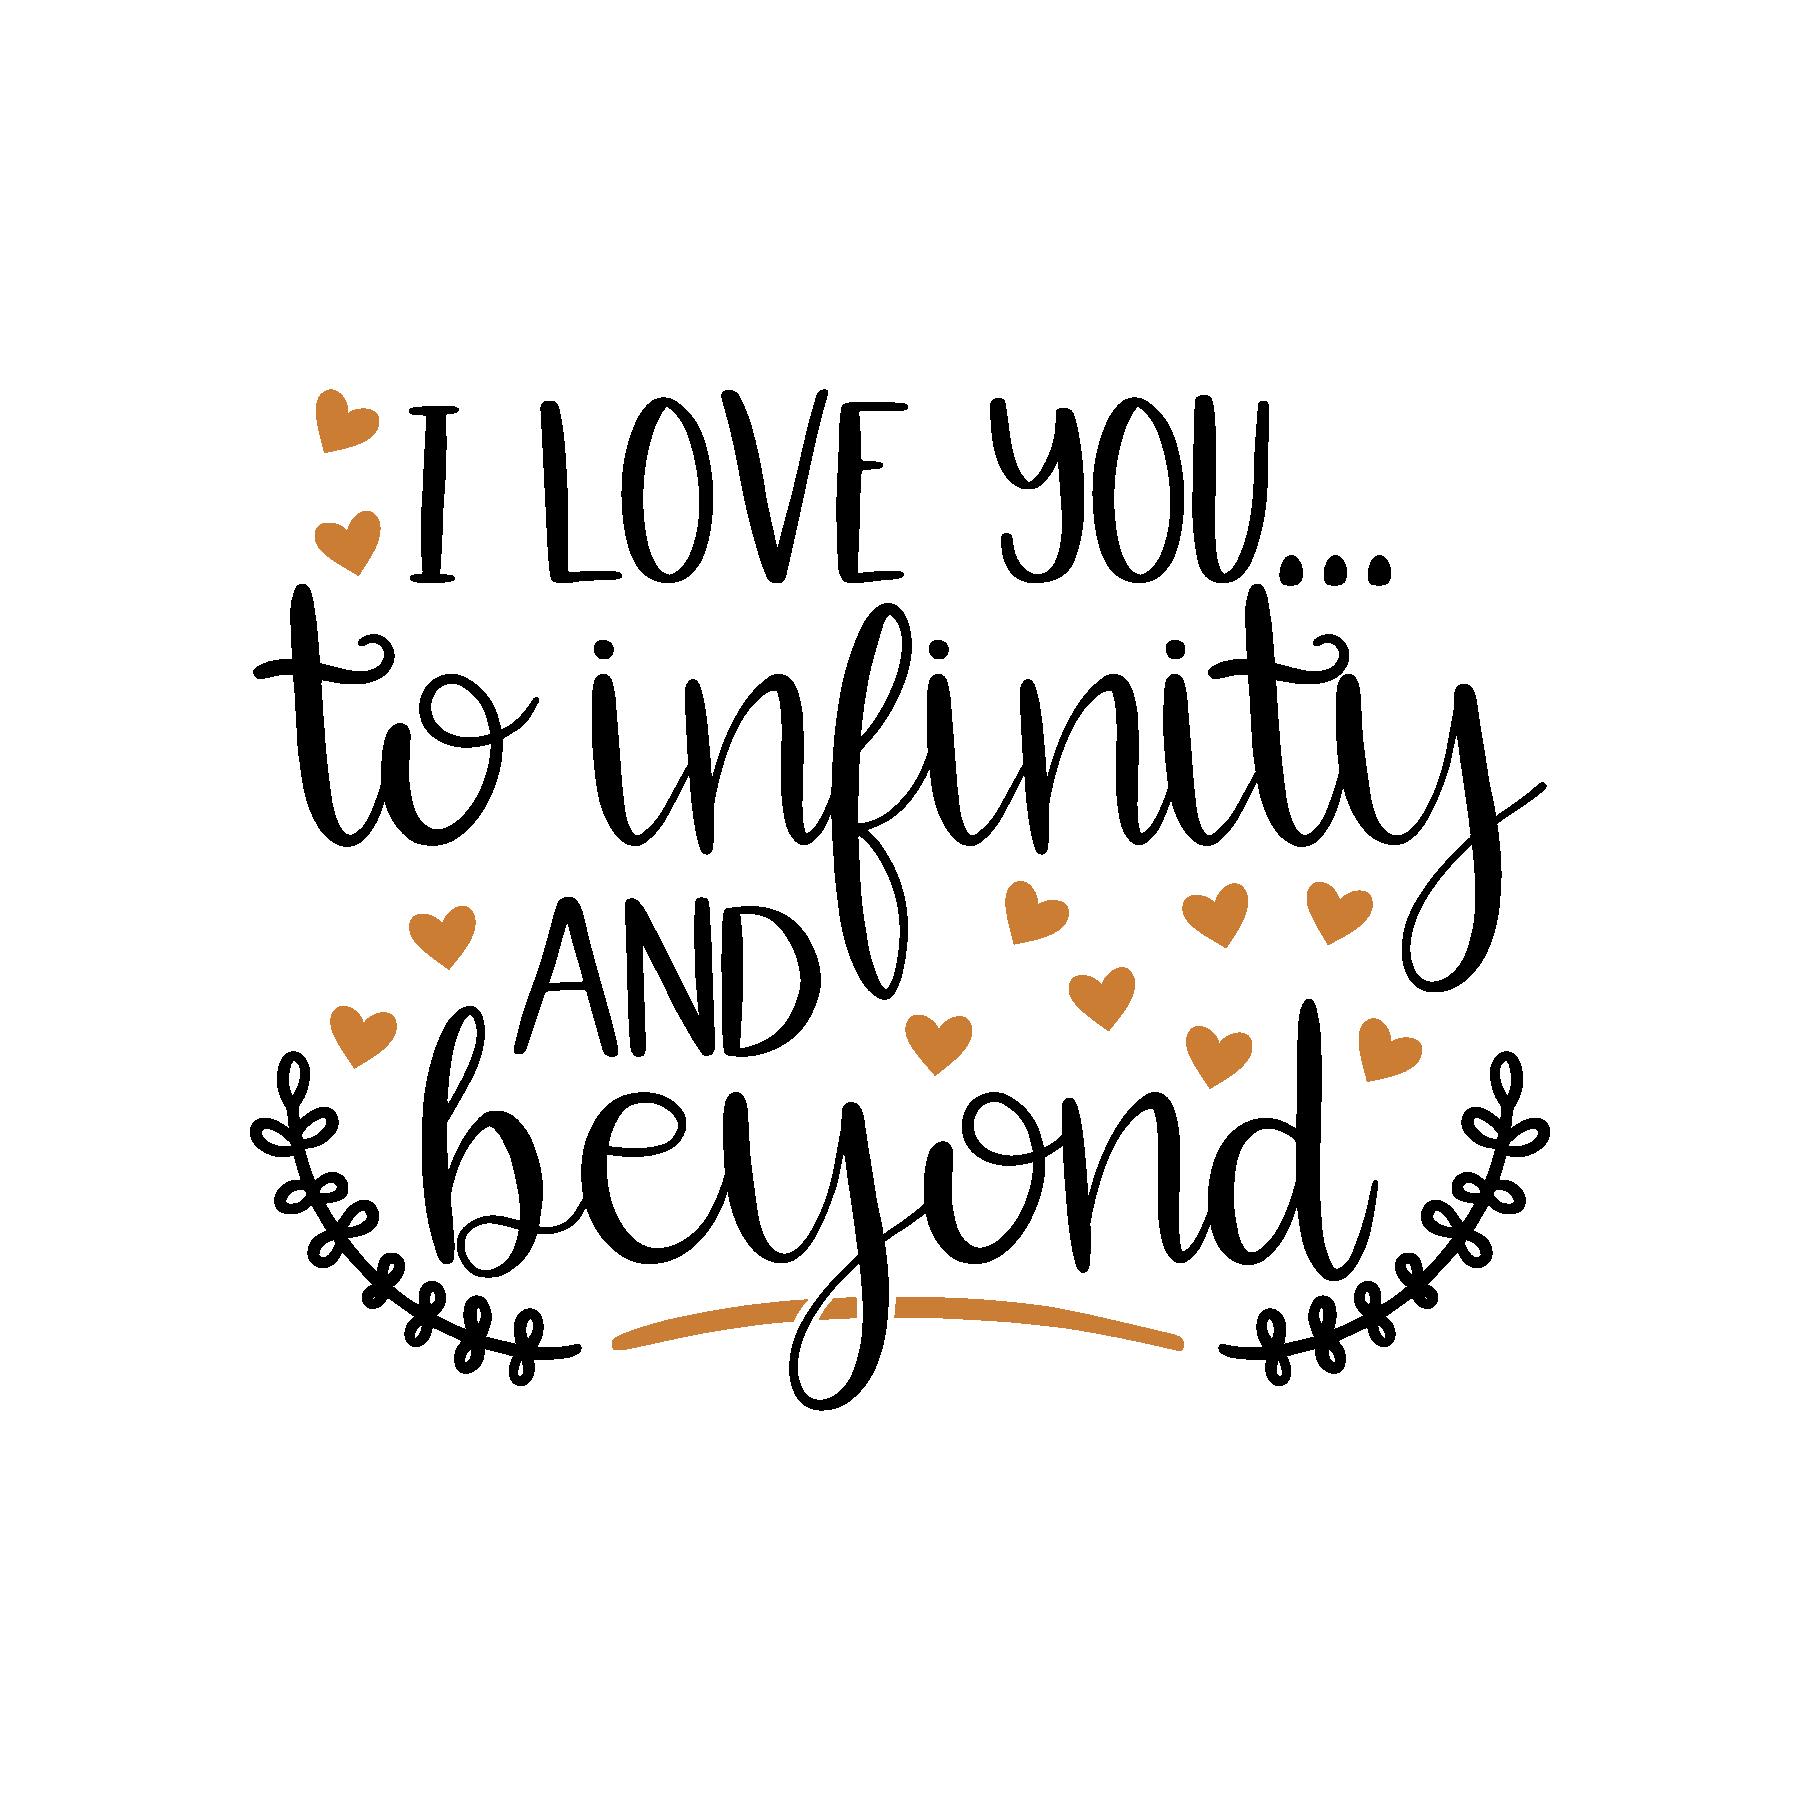 Download Pin by Kate Carroll on Cricut | Cricut, Cricut free, Lettering